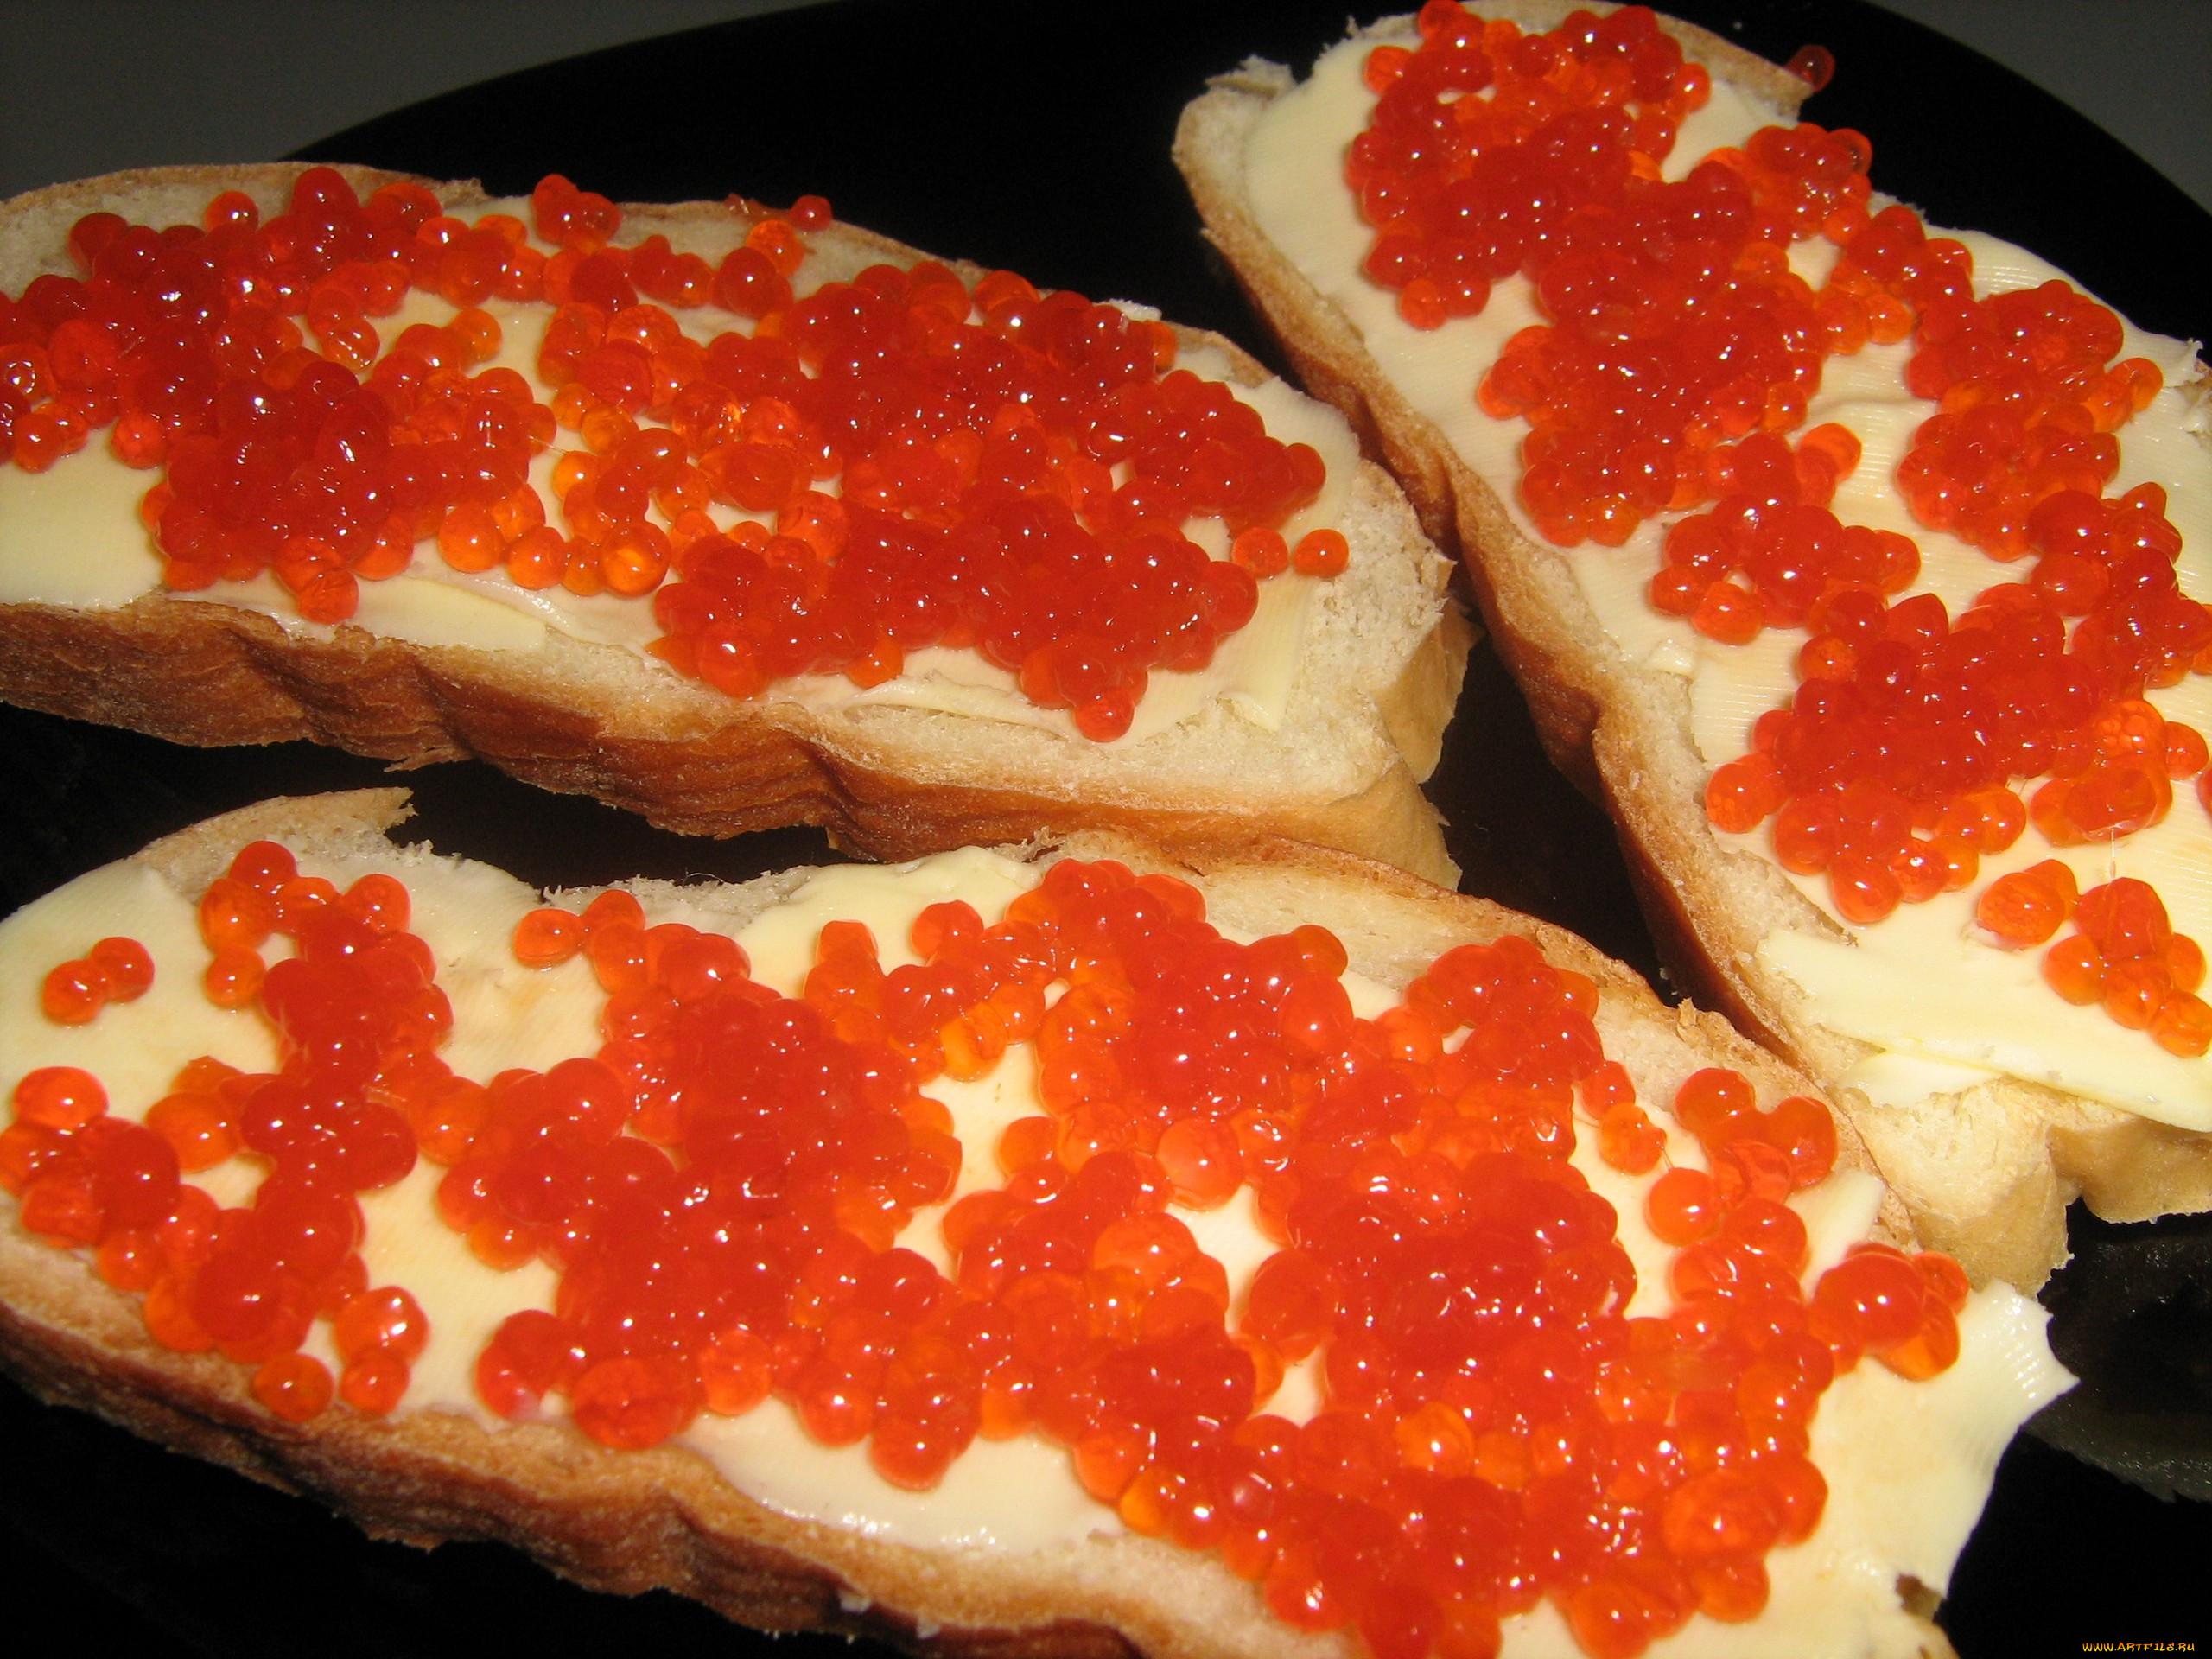 картинка бутерброд с икрой картинки нарезала мозаикой